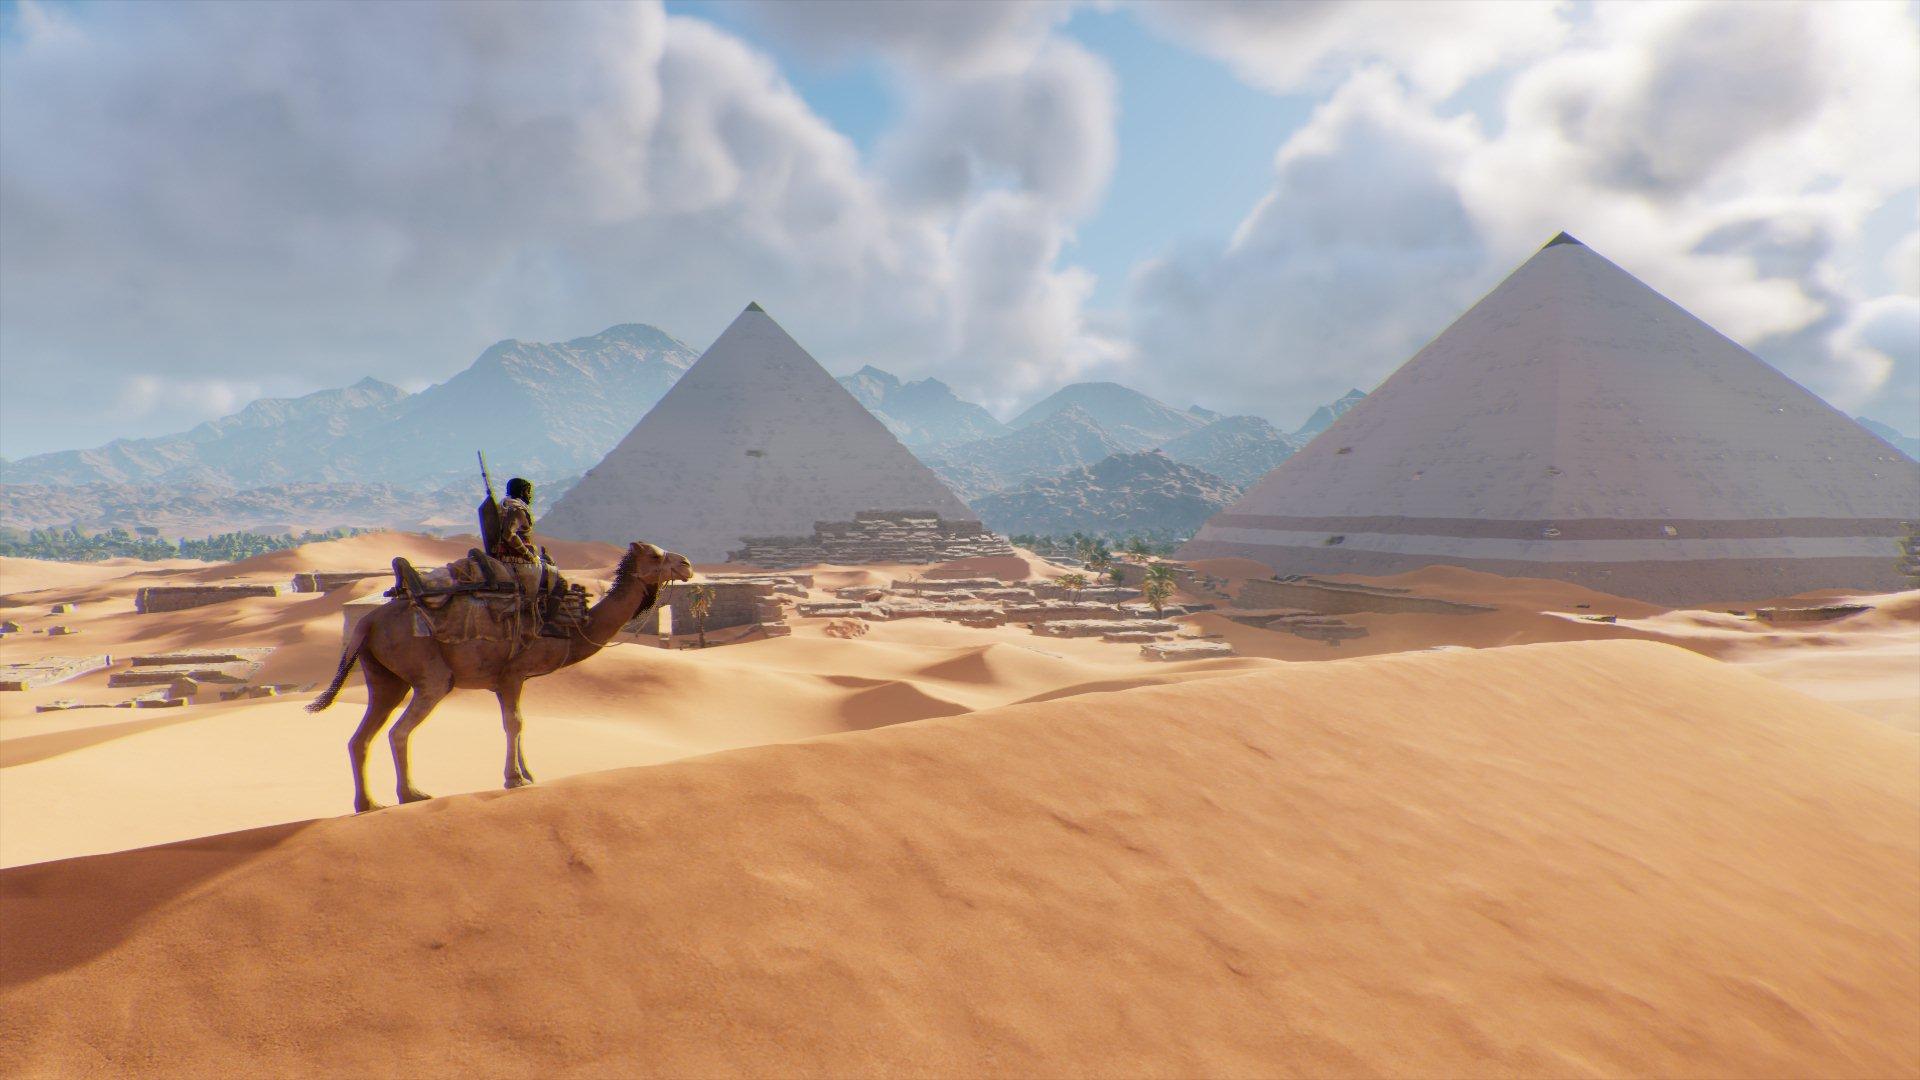 Assassin's Creed Origins - Pyramids of Giza